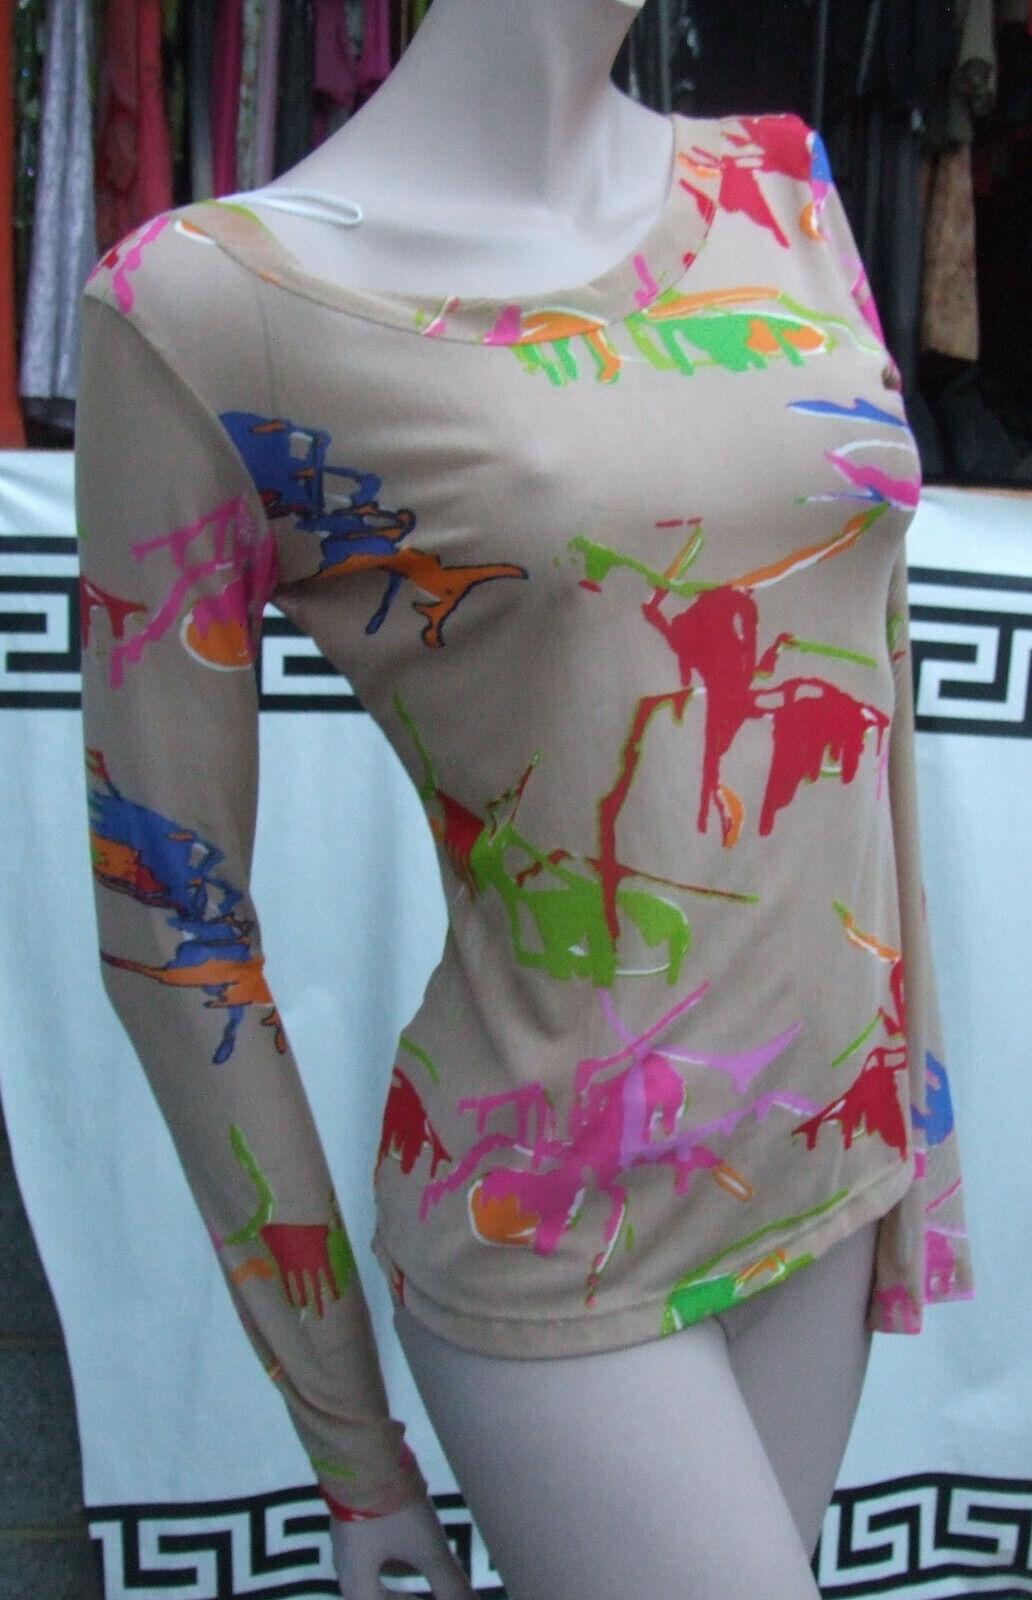 Designer Adolfo Dominguez Limited Edition S Stretch Net Colour Splash Beige Top